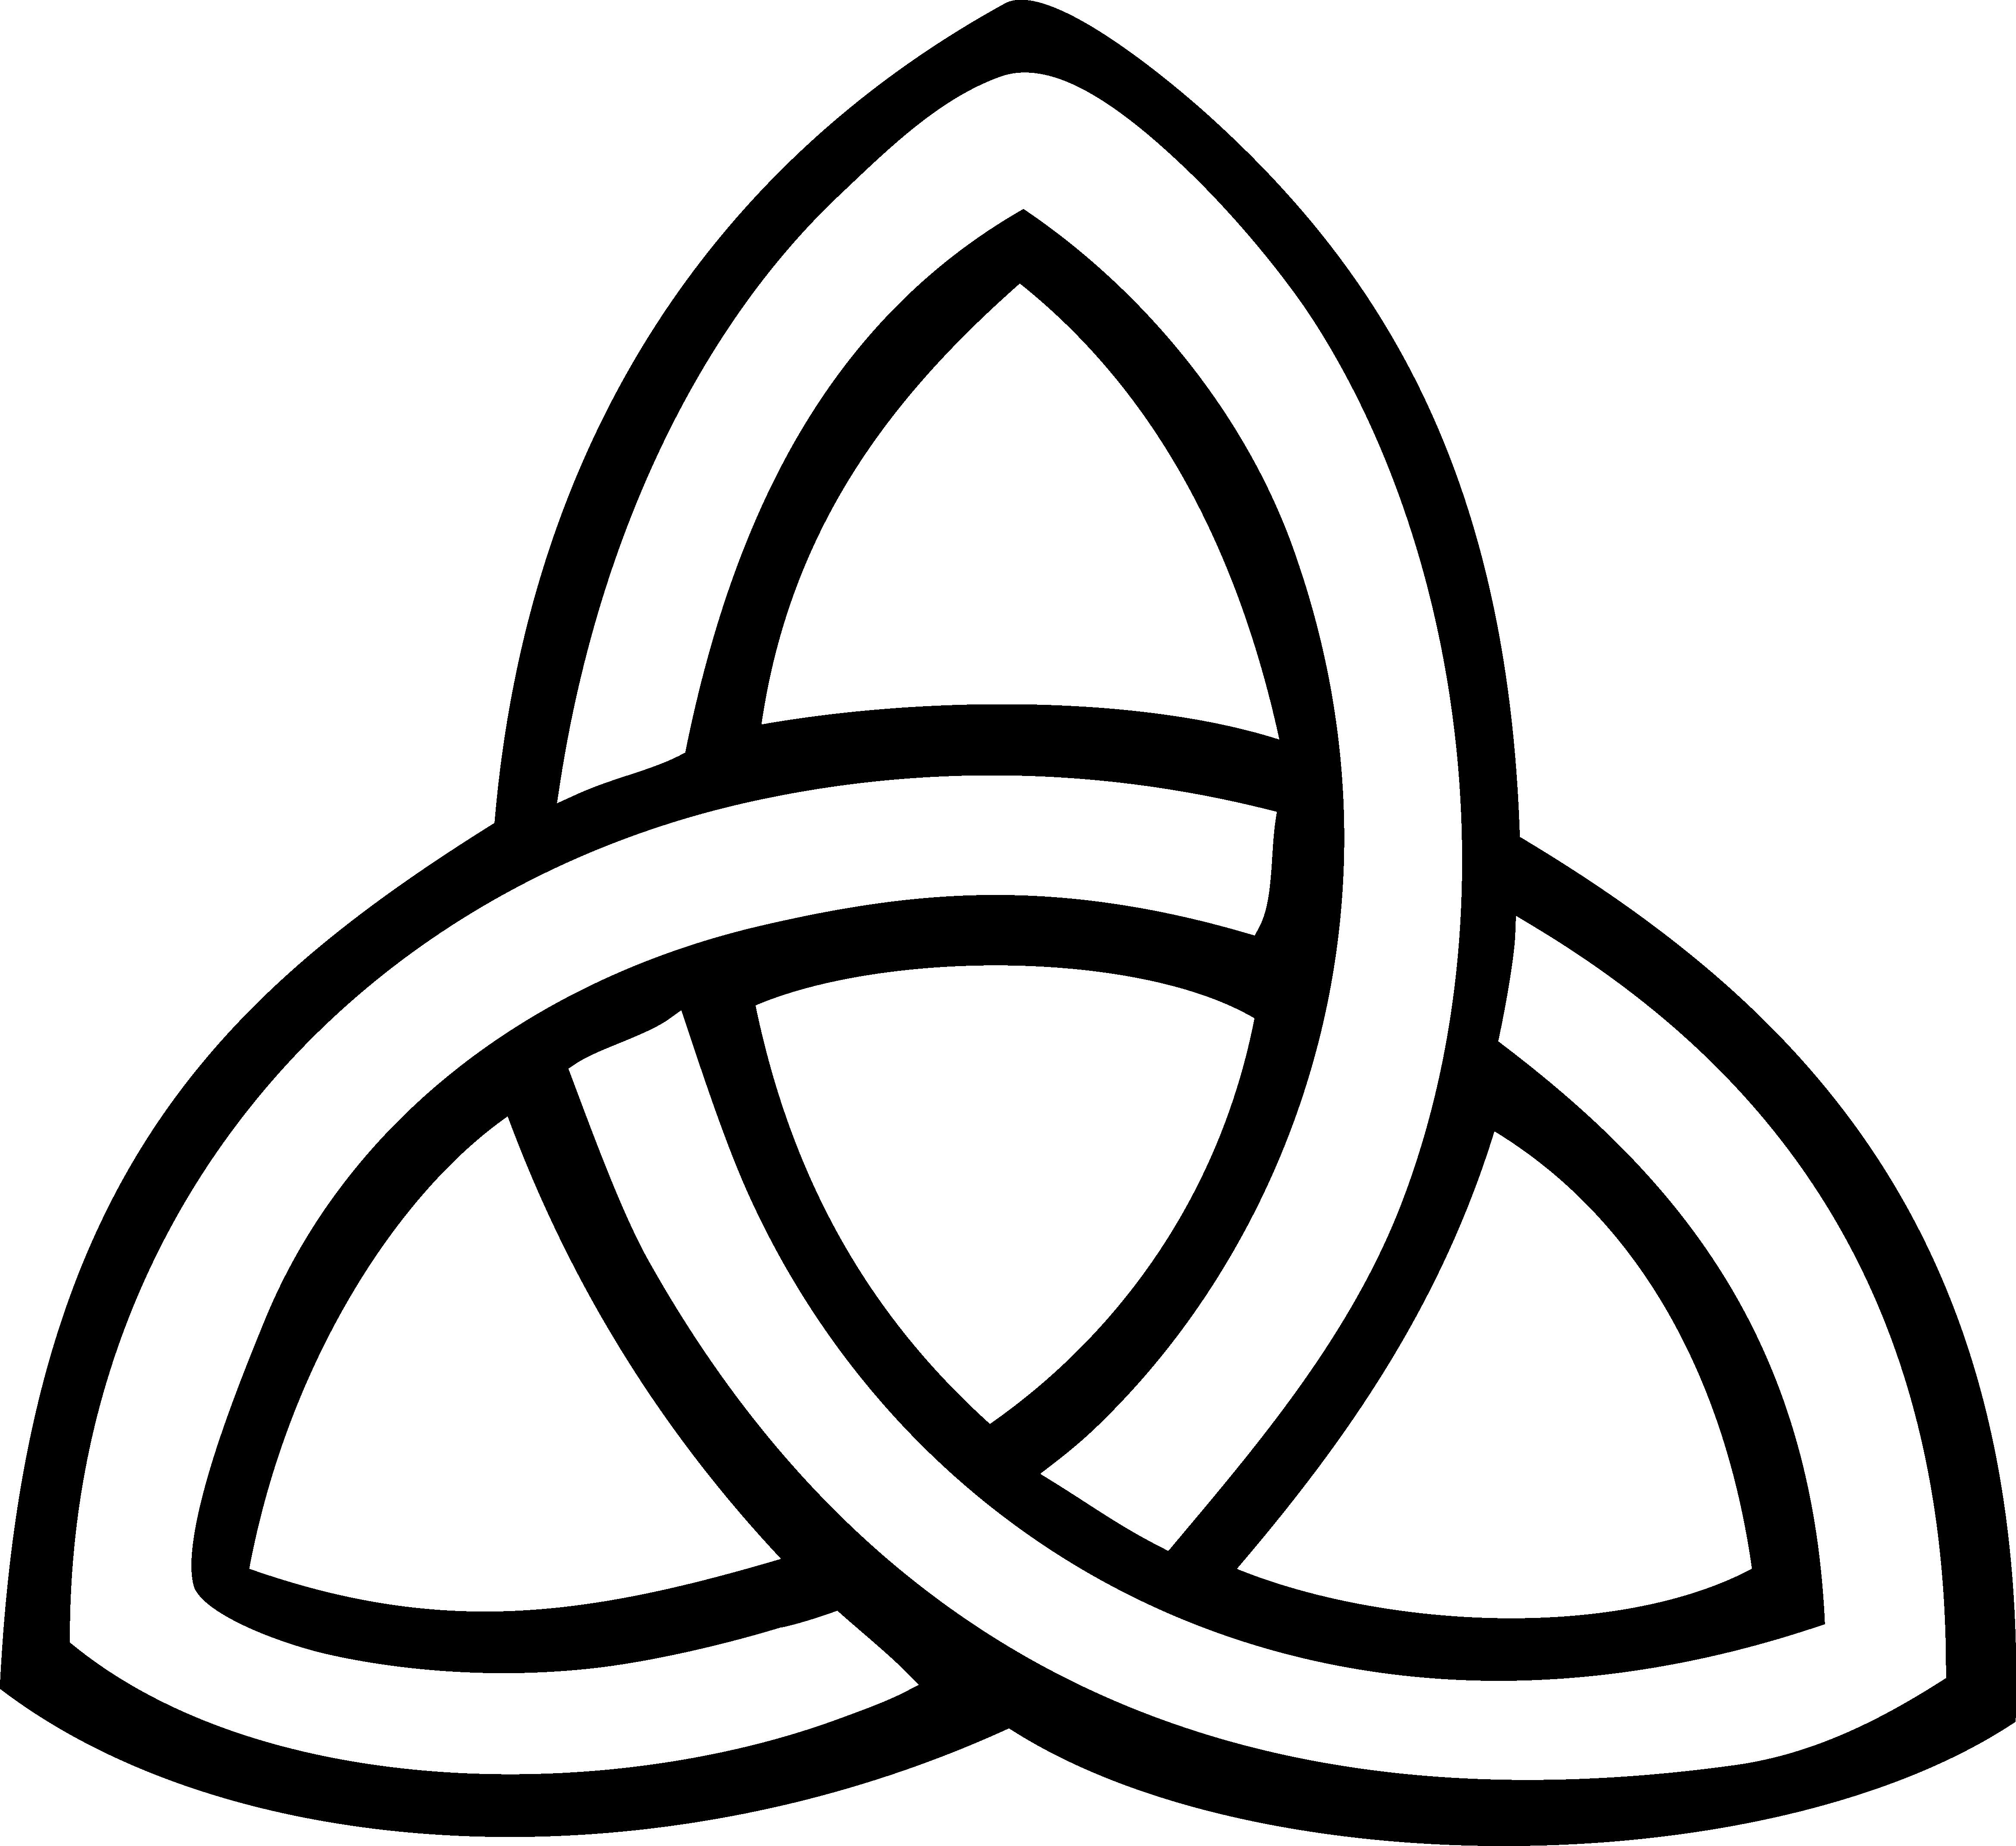 Celt clipart trinity knot Gods Pagan Gods Download Religion